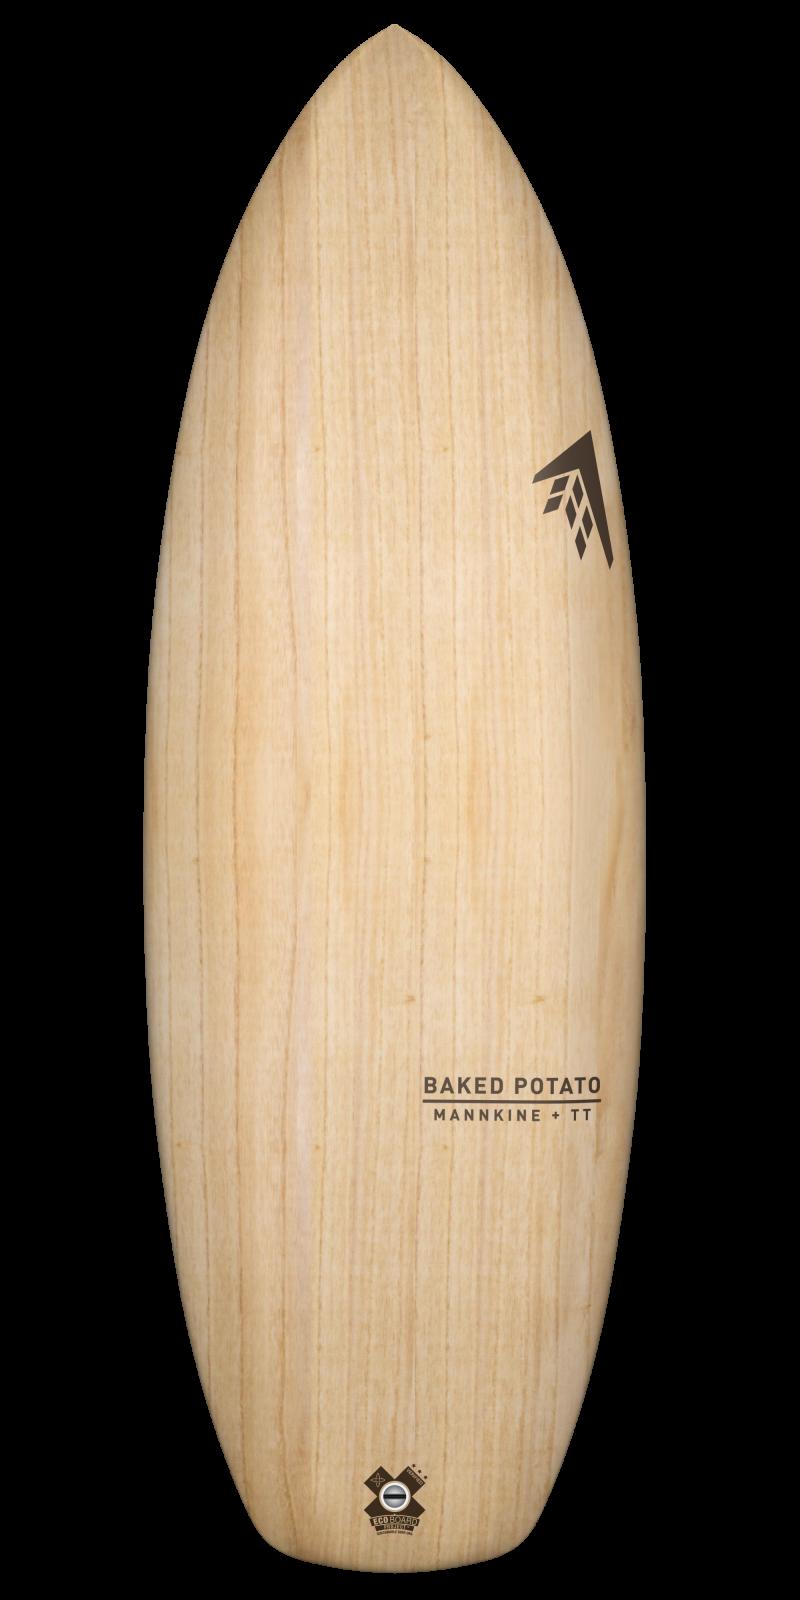 Firewire TT Baked Potato Surfboard (Special Order)